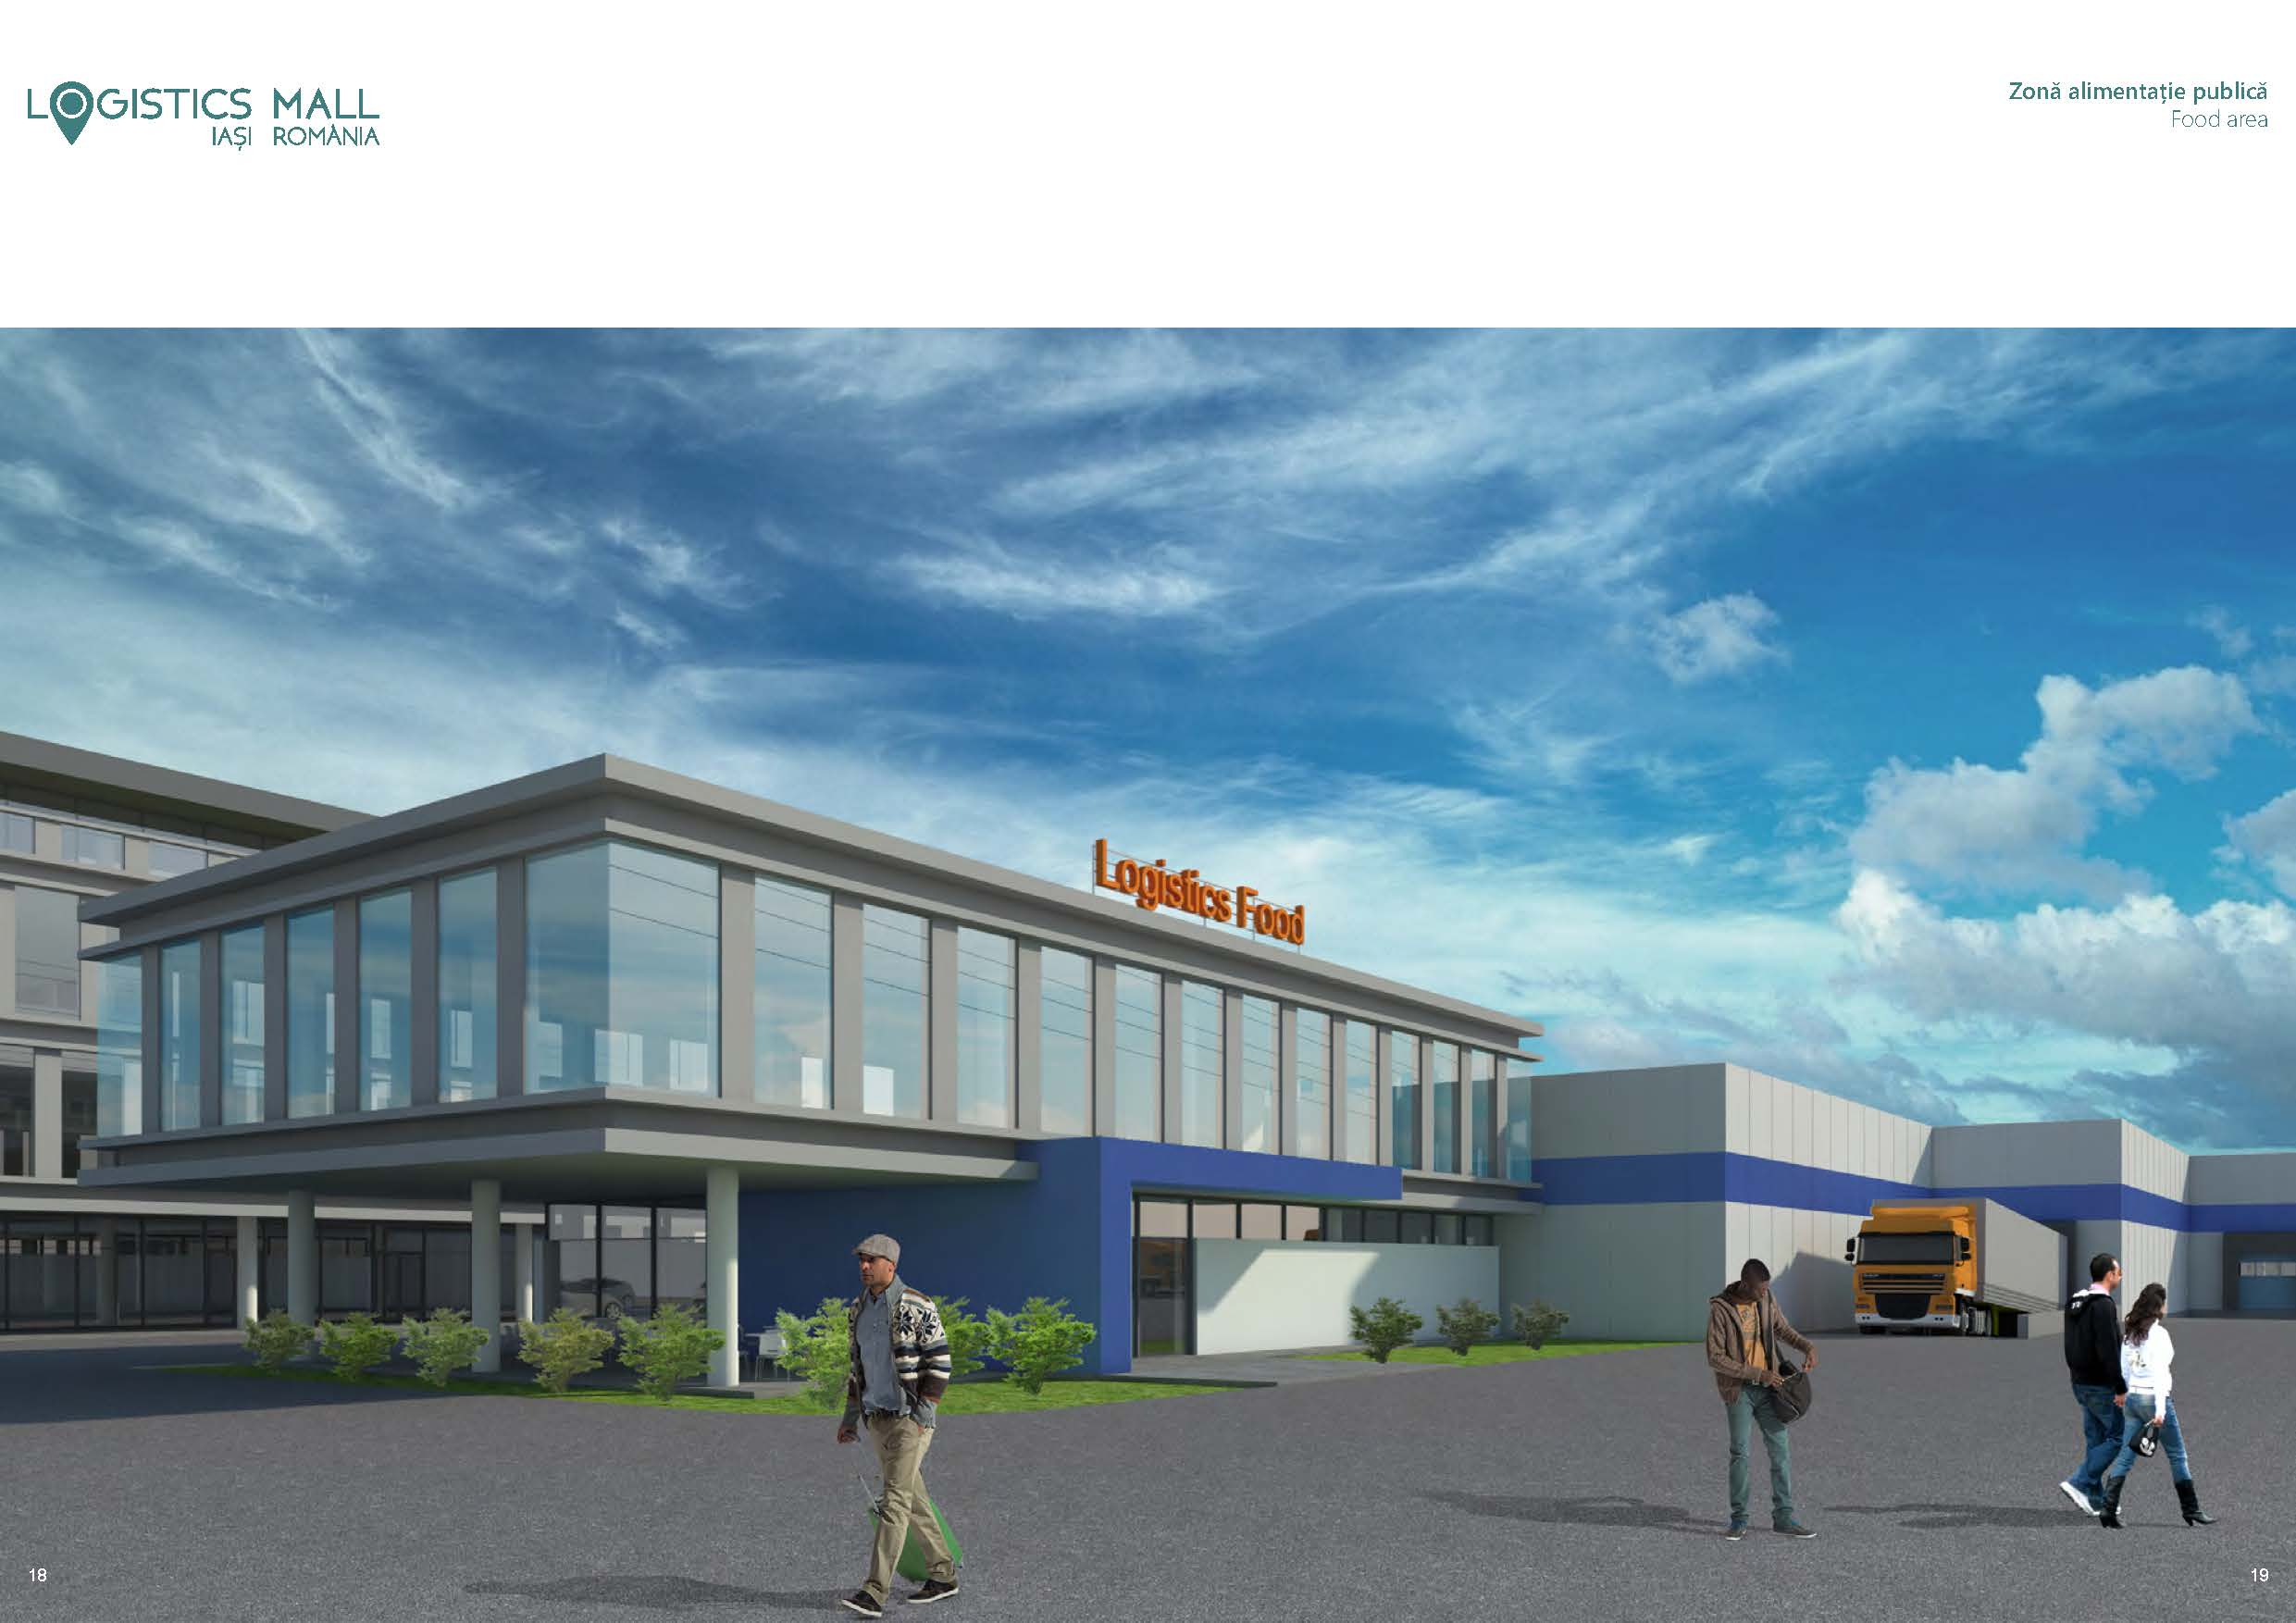 26n-vizualizare-brosura-logistics-mall-iasi_page_11